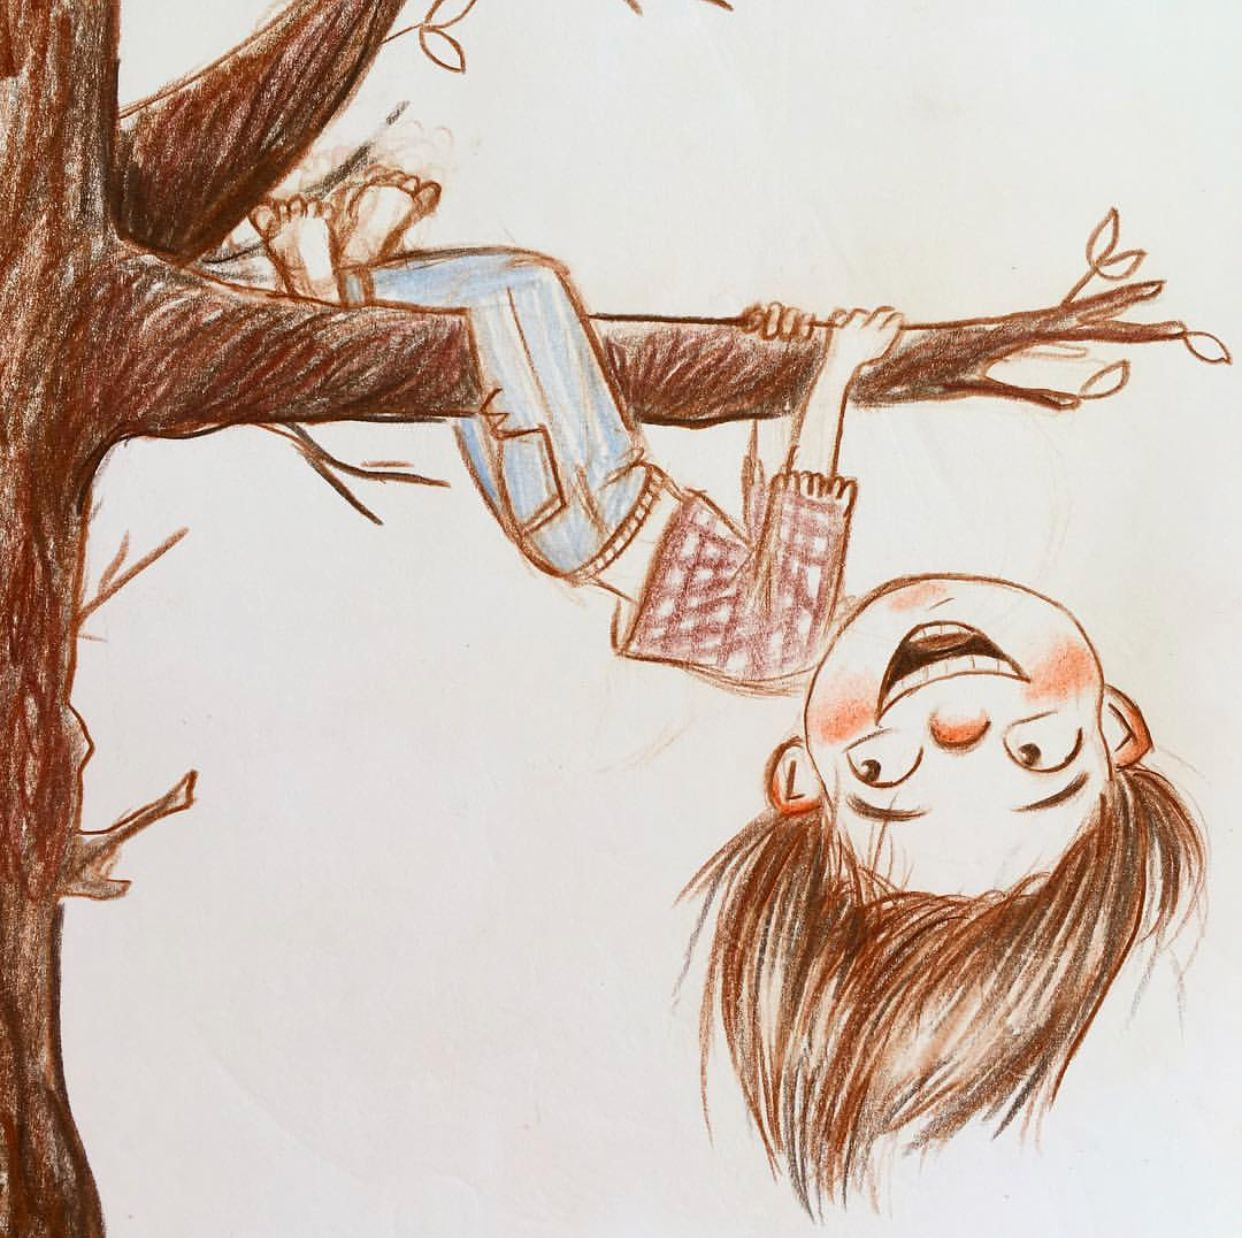 Girl Hanging Upside Down From Tree Miriam Kraft Tree Drawing Drawing People Artist Inspiration